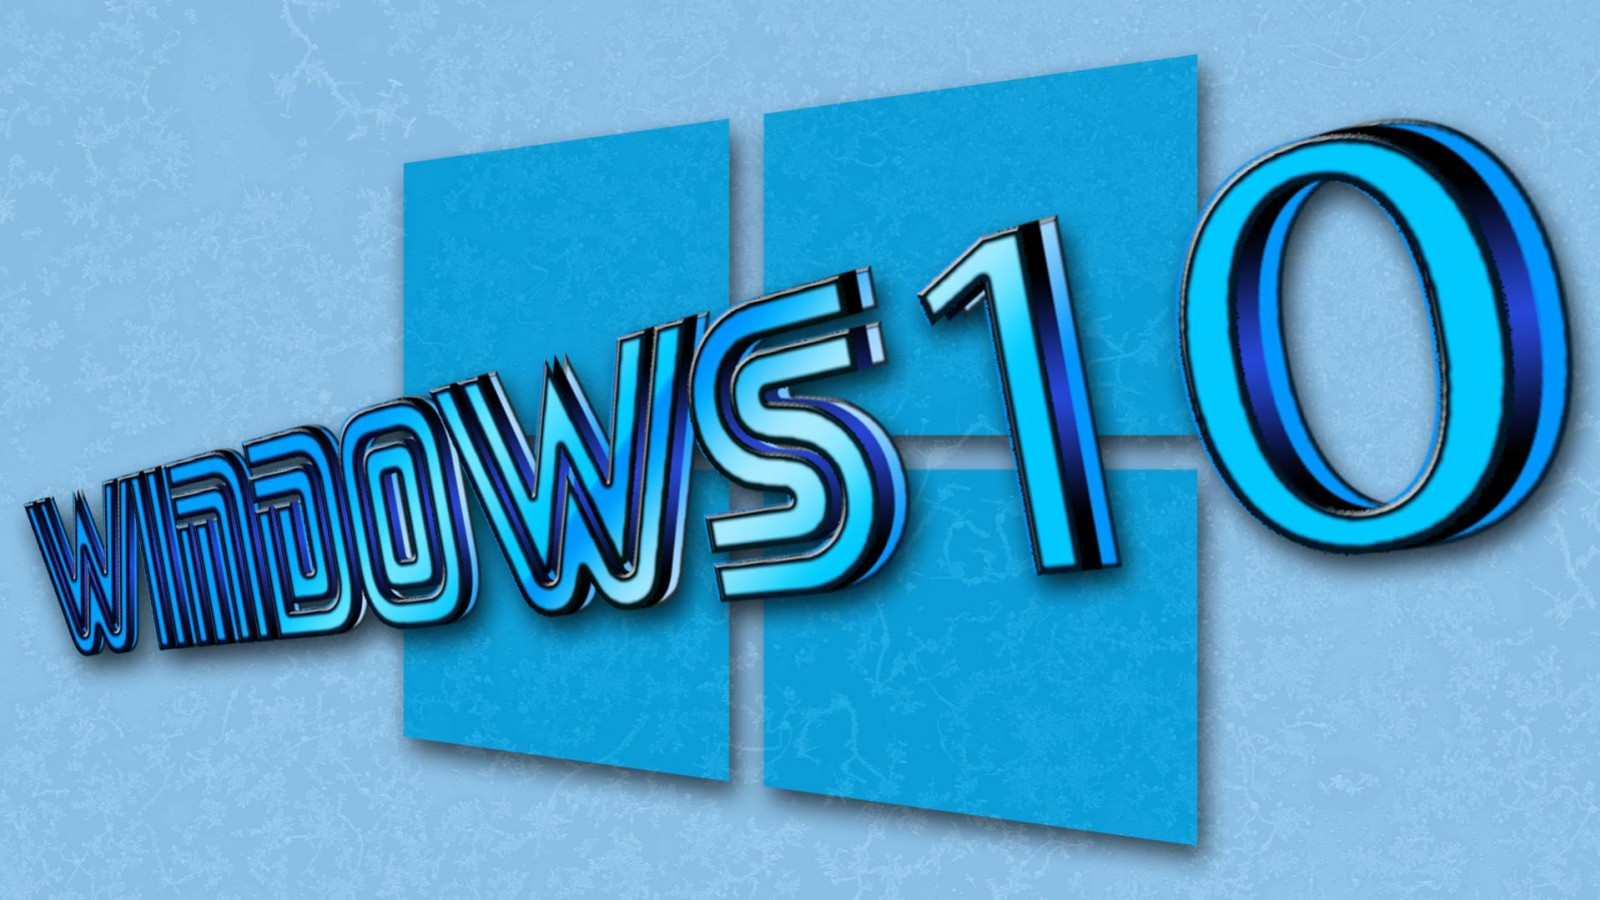 Windows 10 Logo wallpaper 1600x900   Wallpaper   Wallpaper Style 1600x900